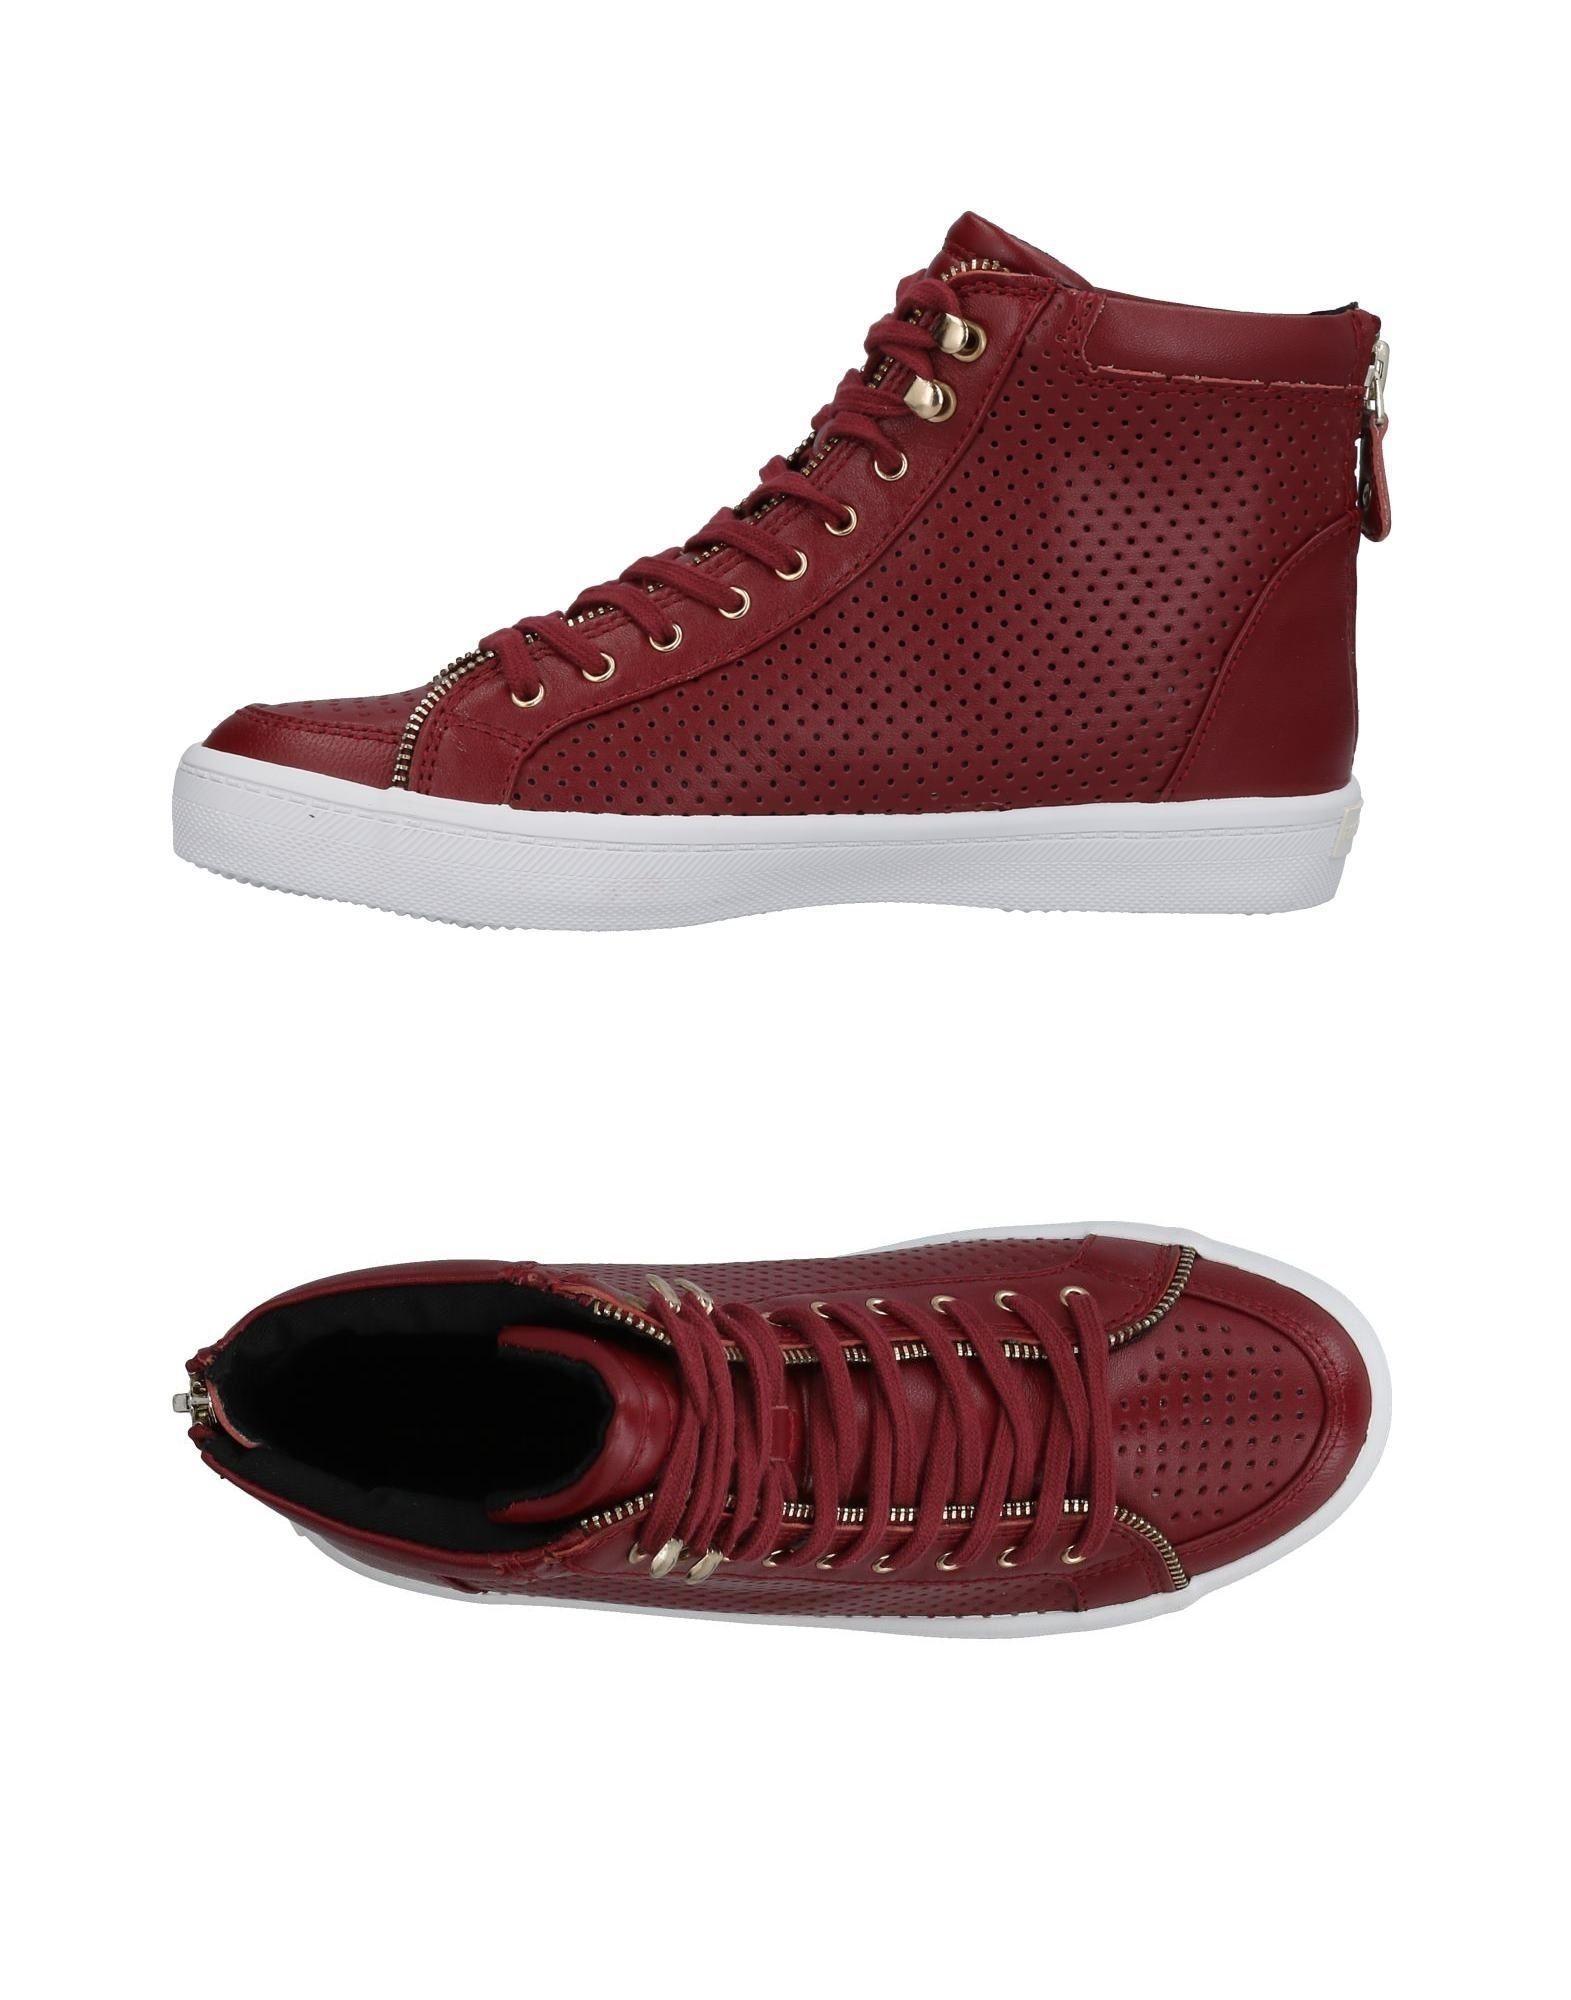 Rebecca Minkoff Sneakers In Brick Red